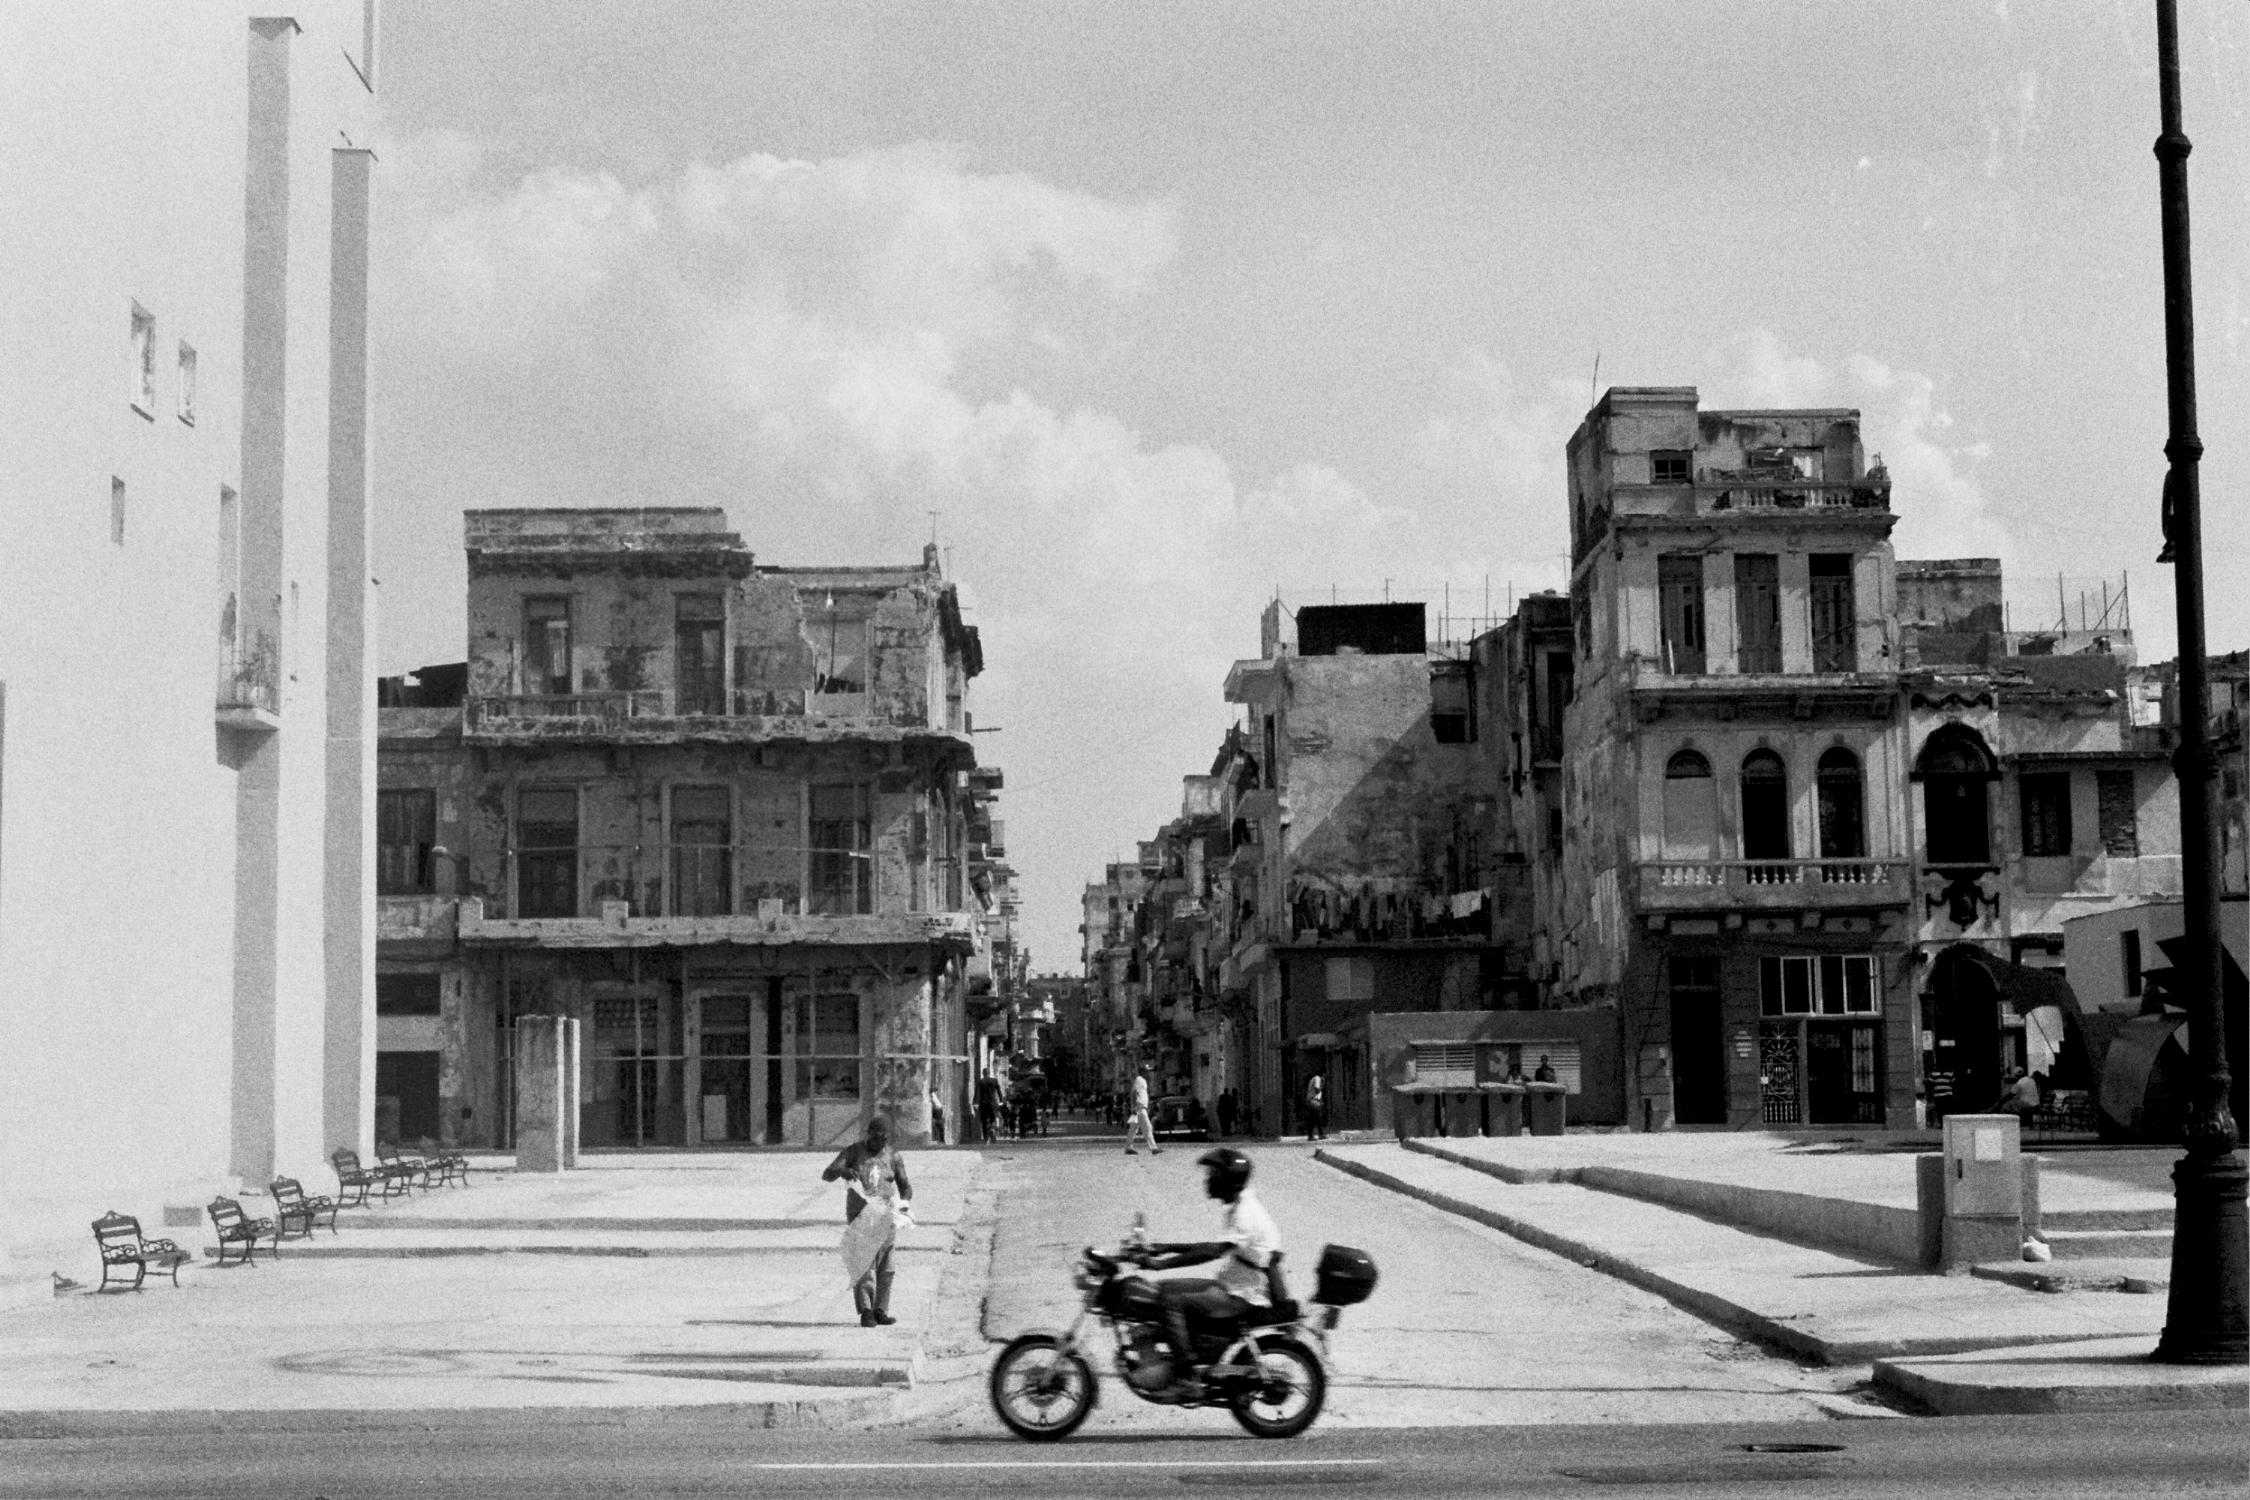 Havana, Cuba, 2016